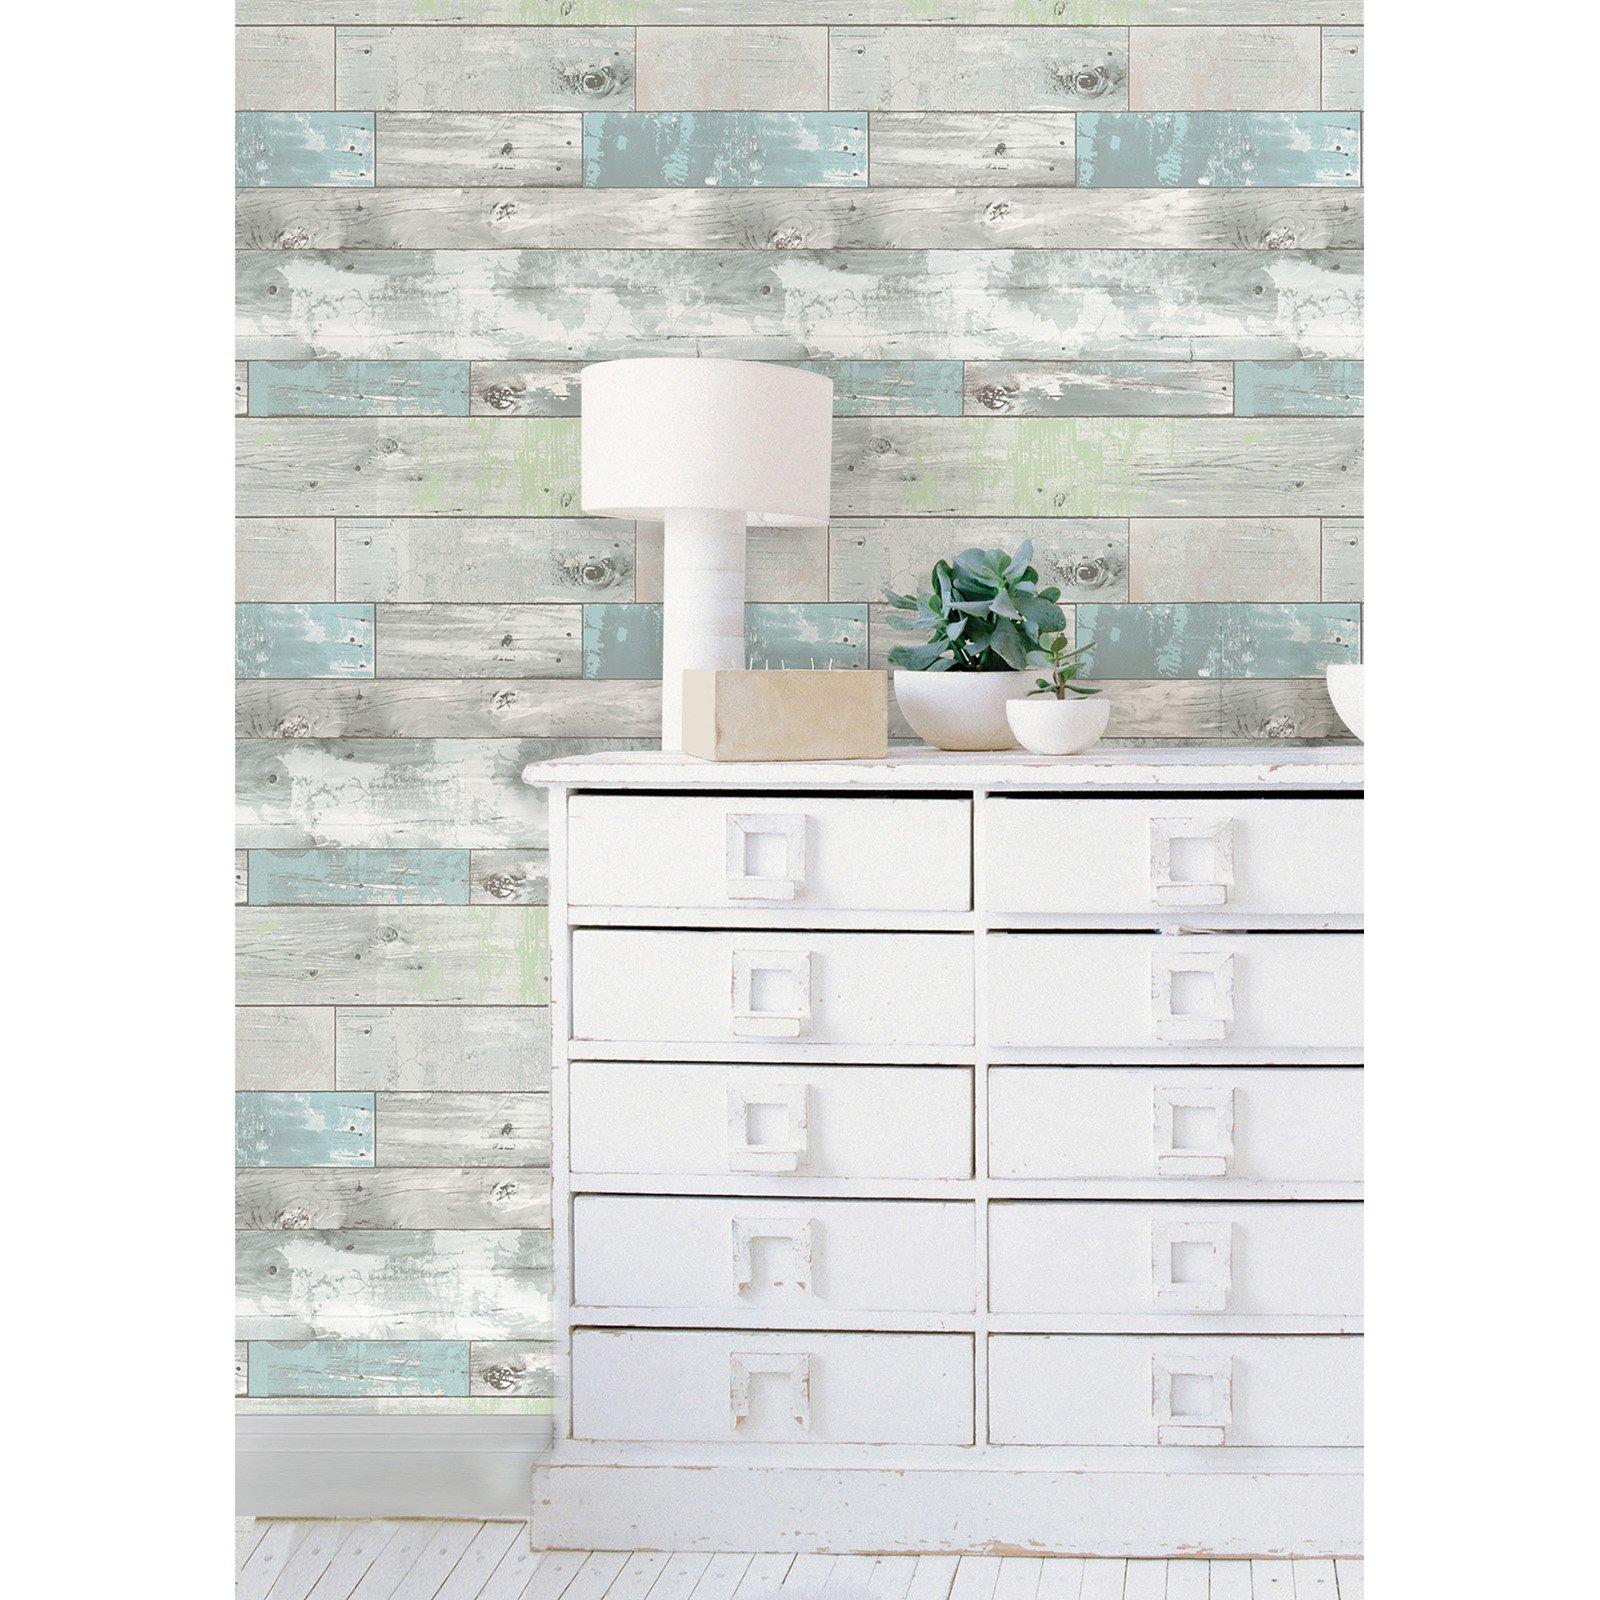 Self Stick Wallpaper Rolls WallpaperSafari